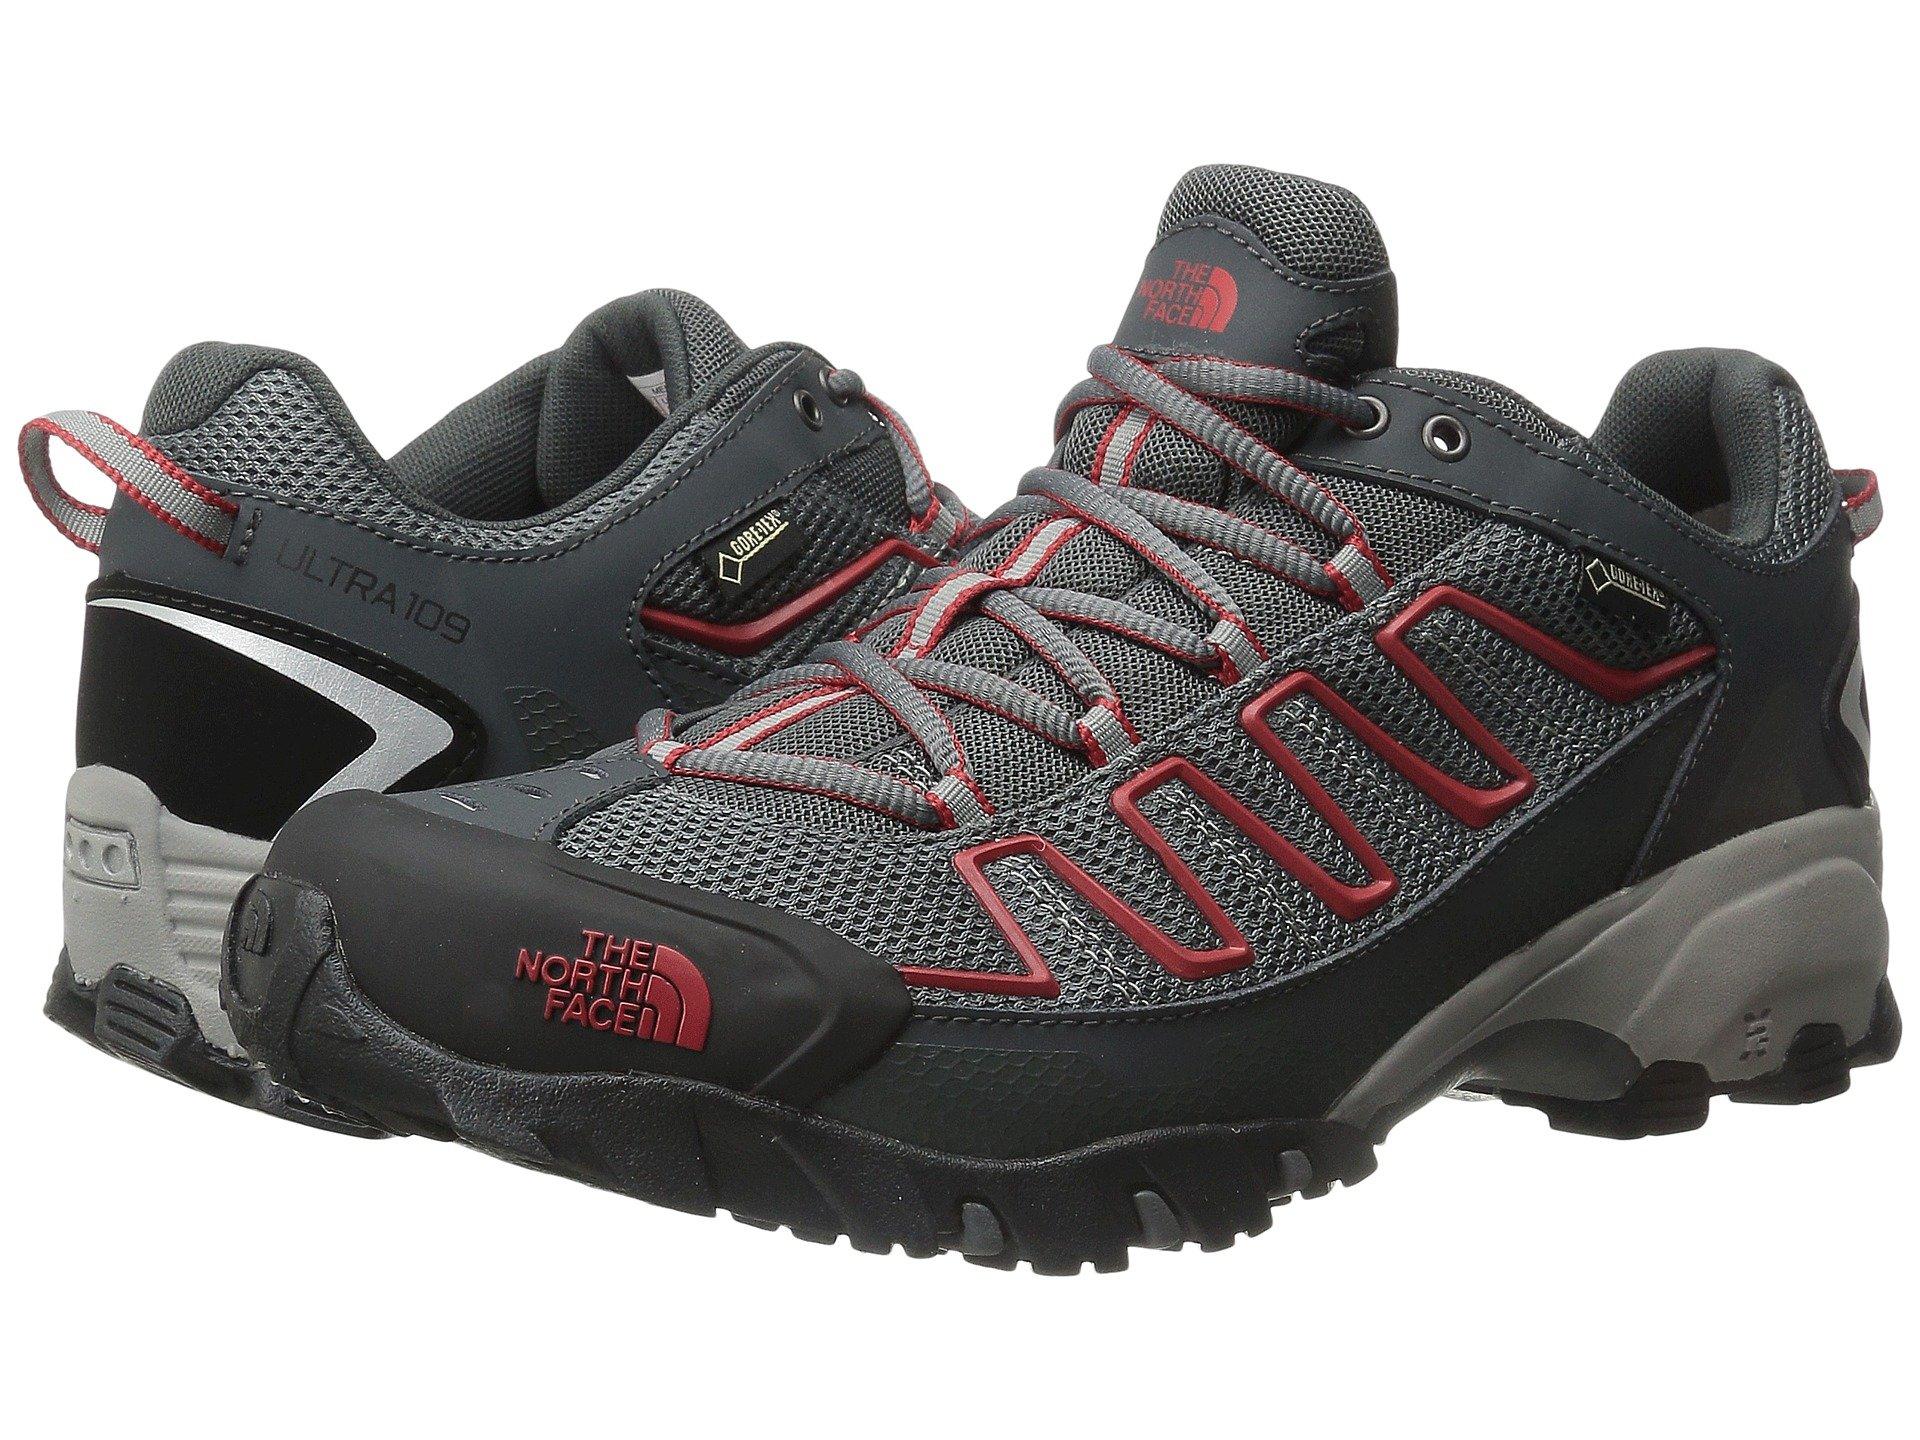 a0b3f0e08e69 Men s The North Face Shoes + FREE SHIPPING